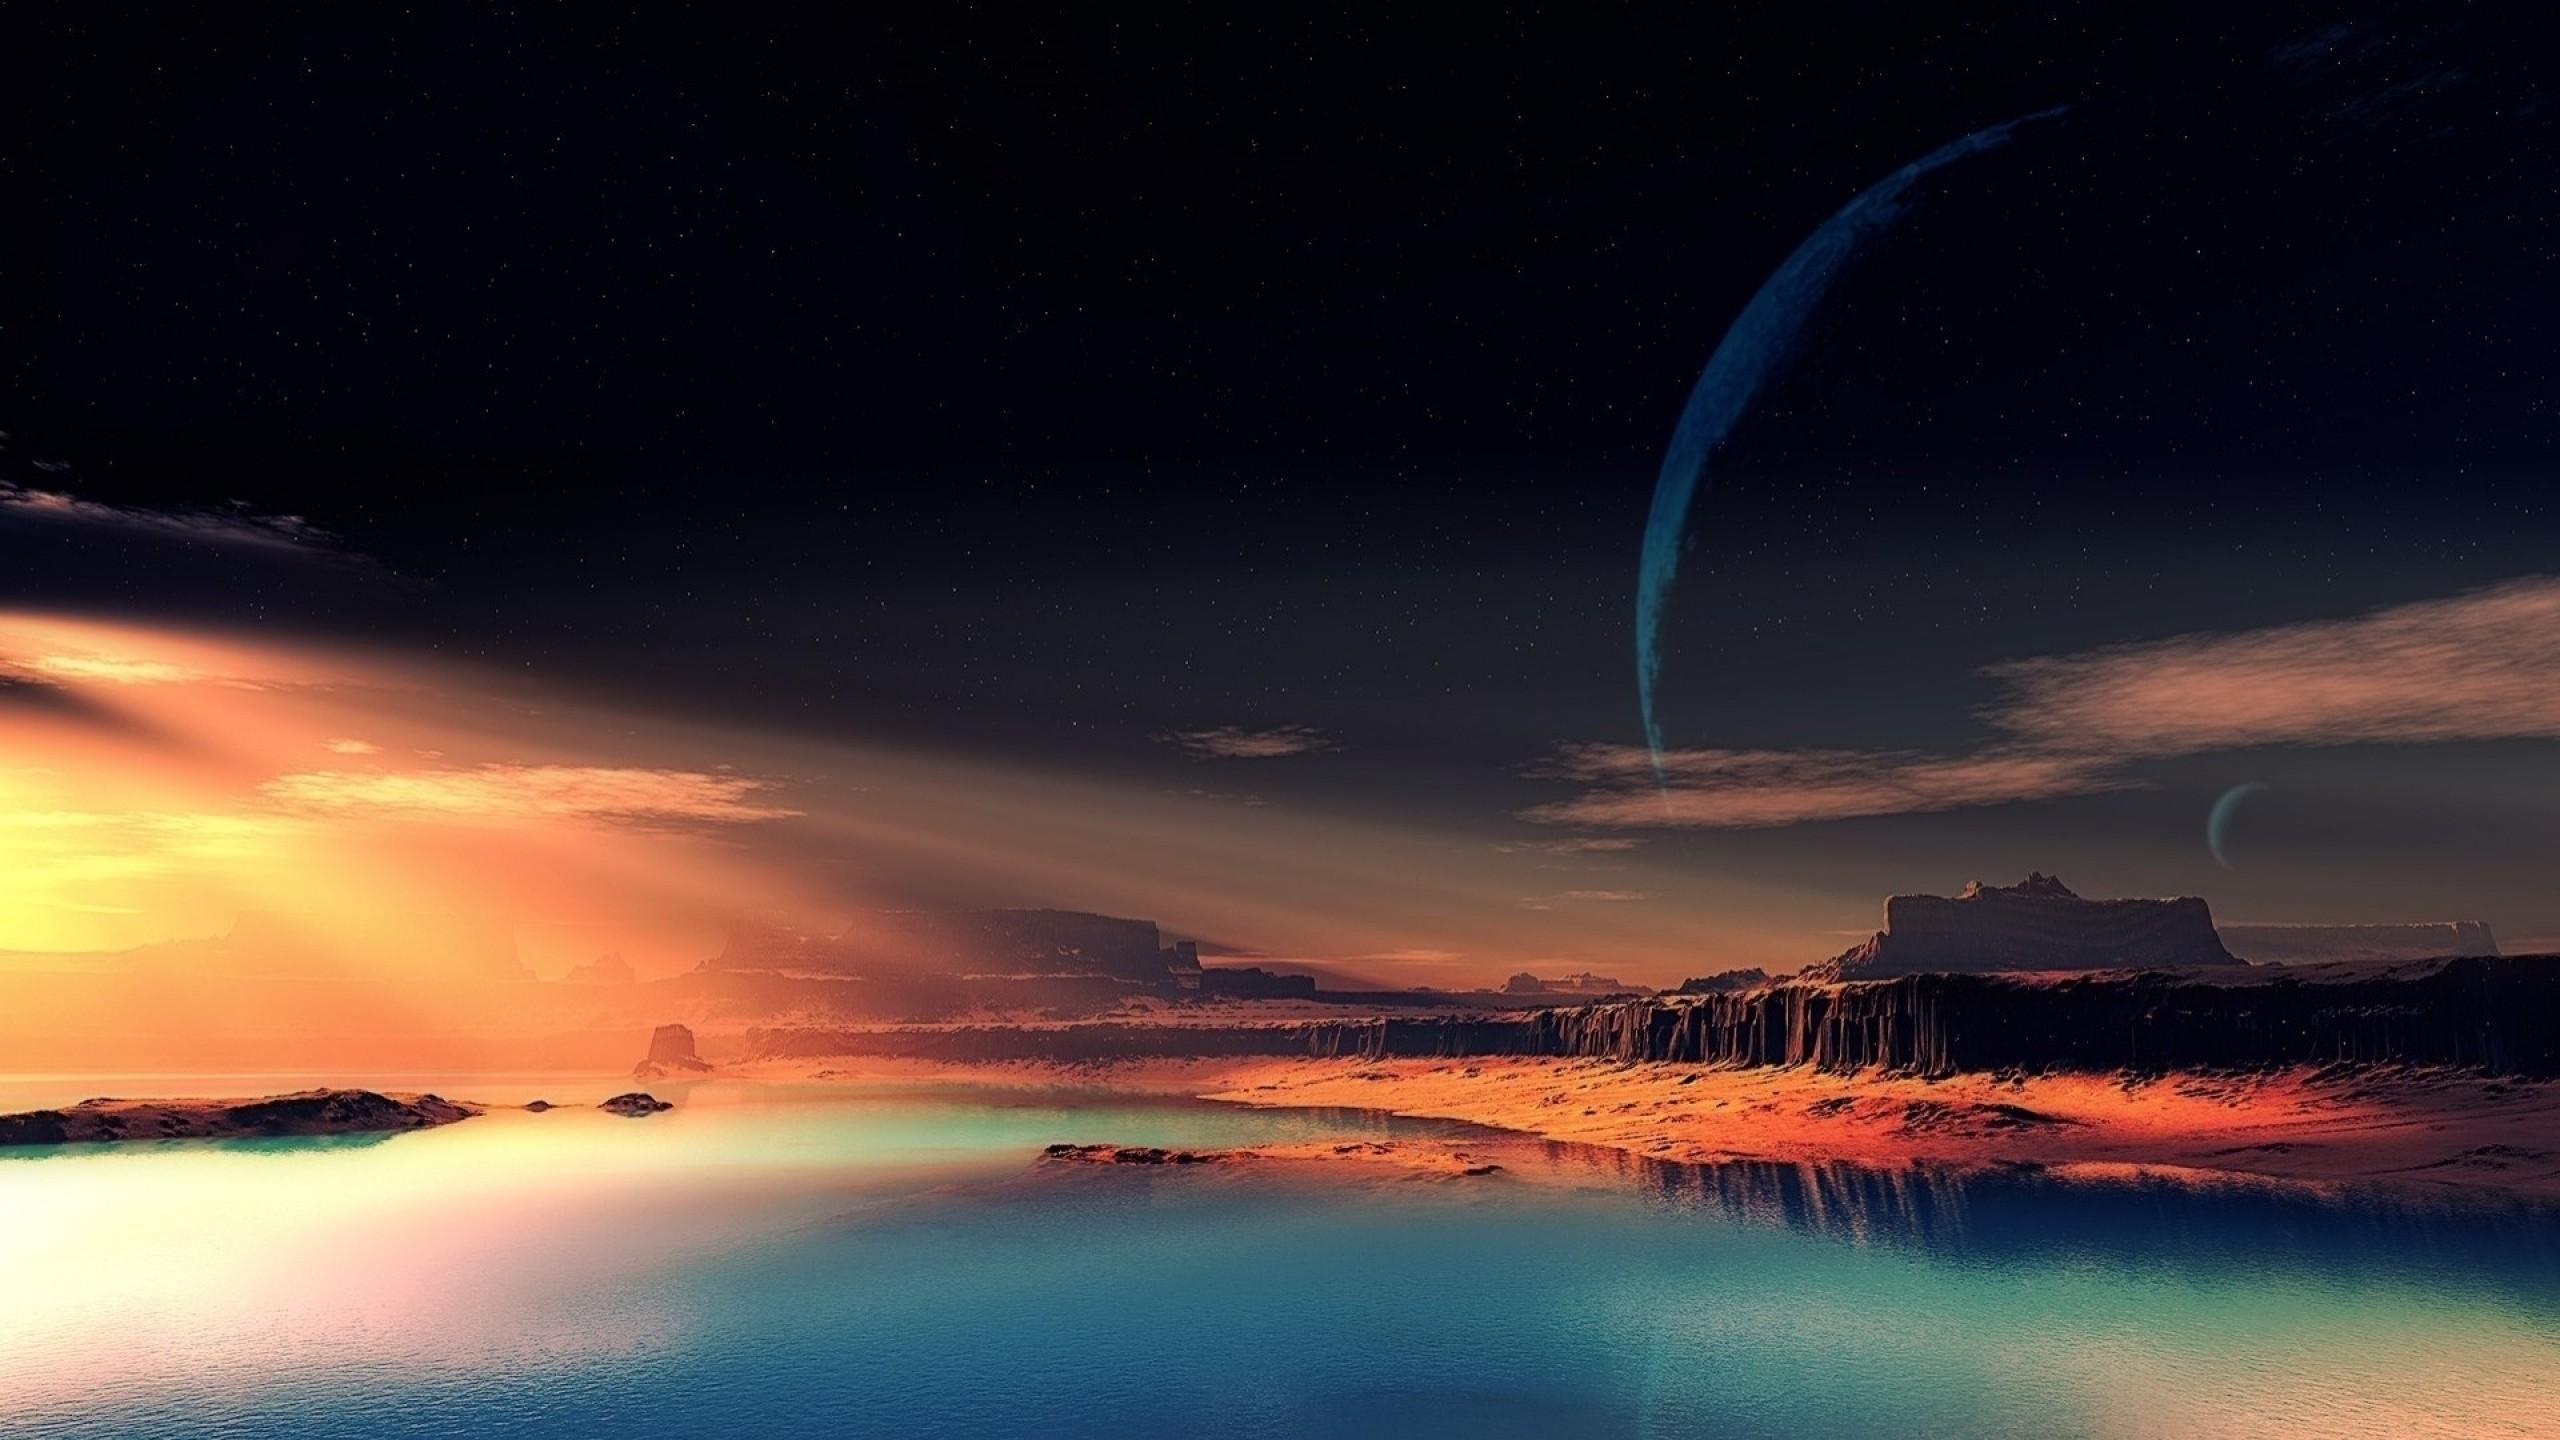 Wallpaper nature, night, space, beautiful